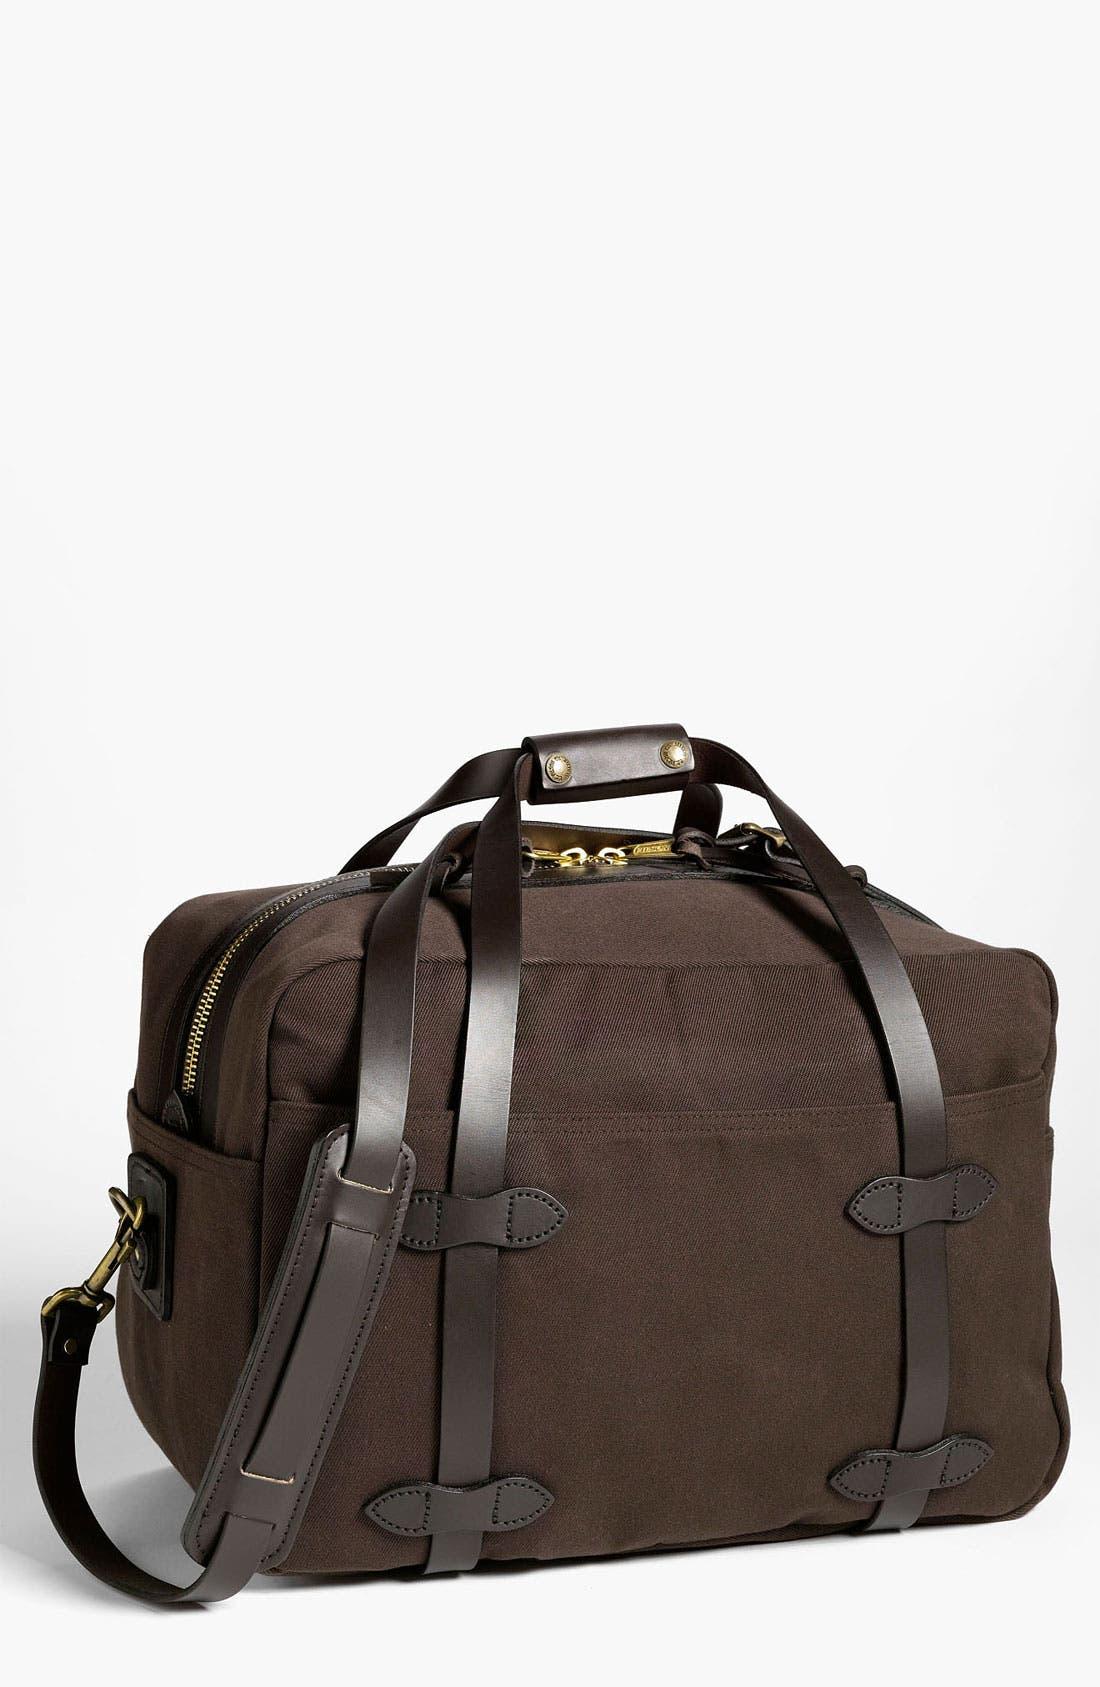 Medium Travel Bag, Main, color, 200